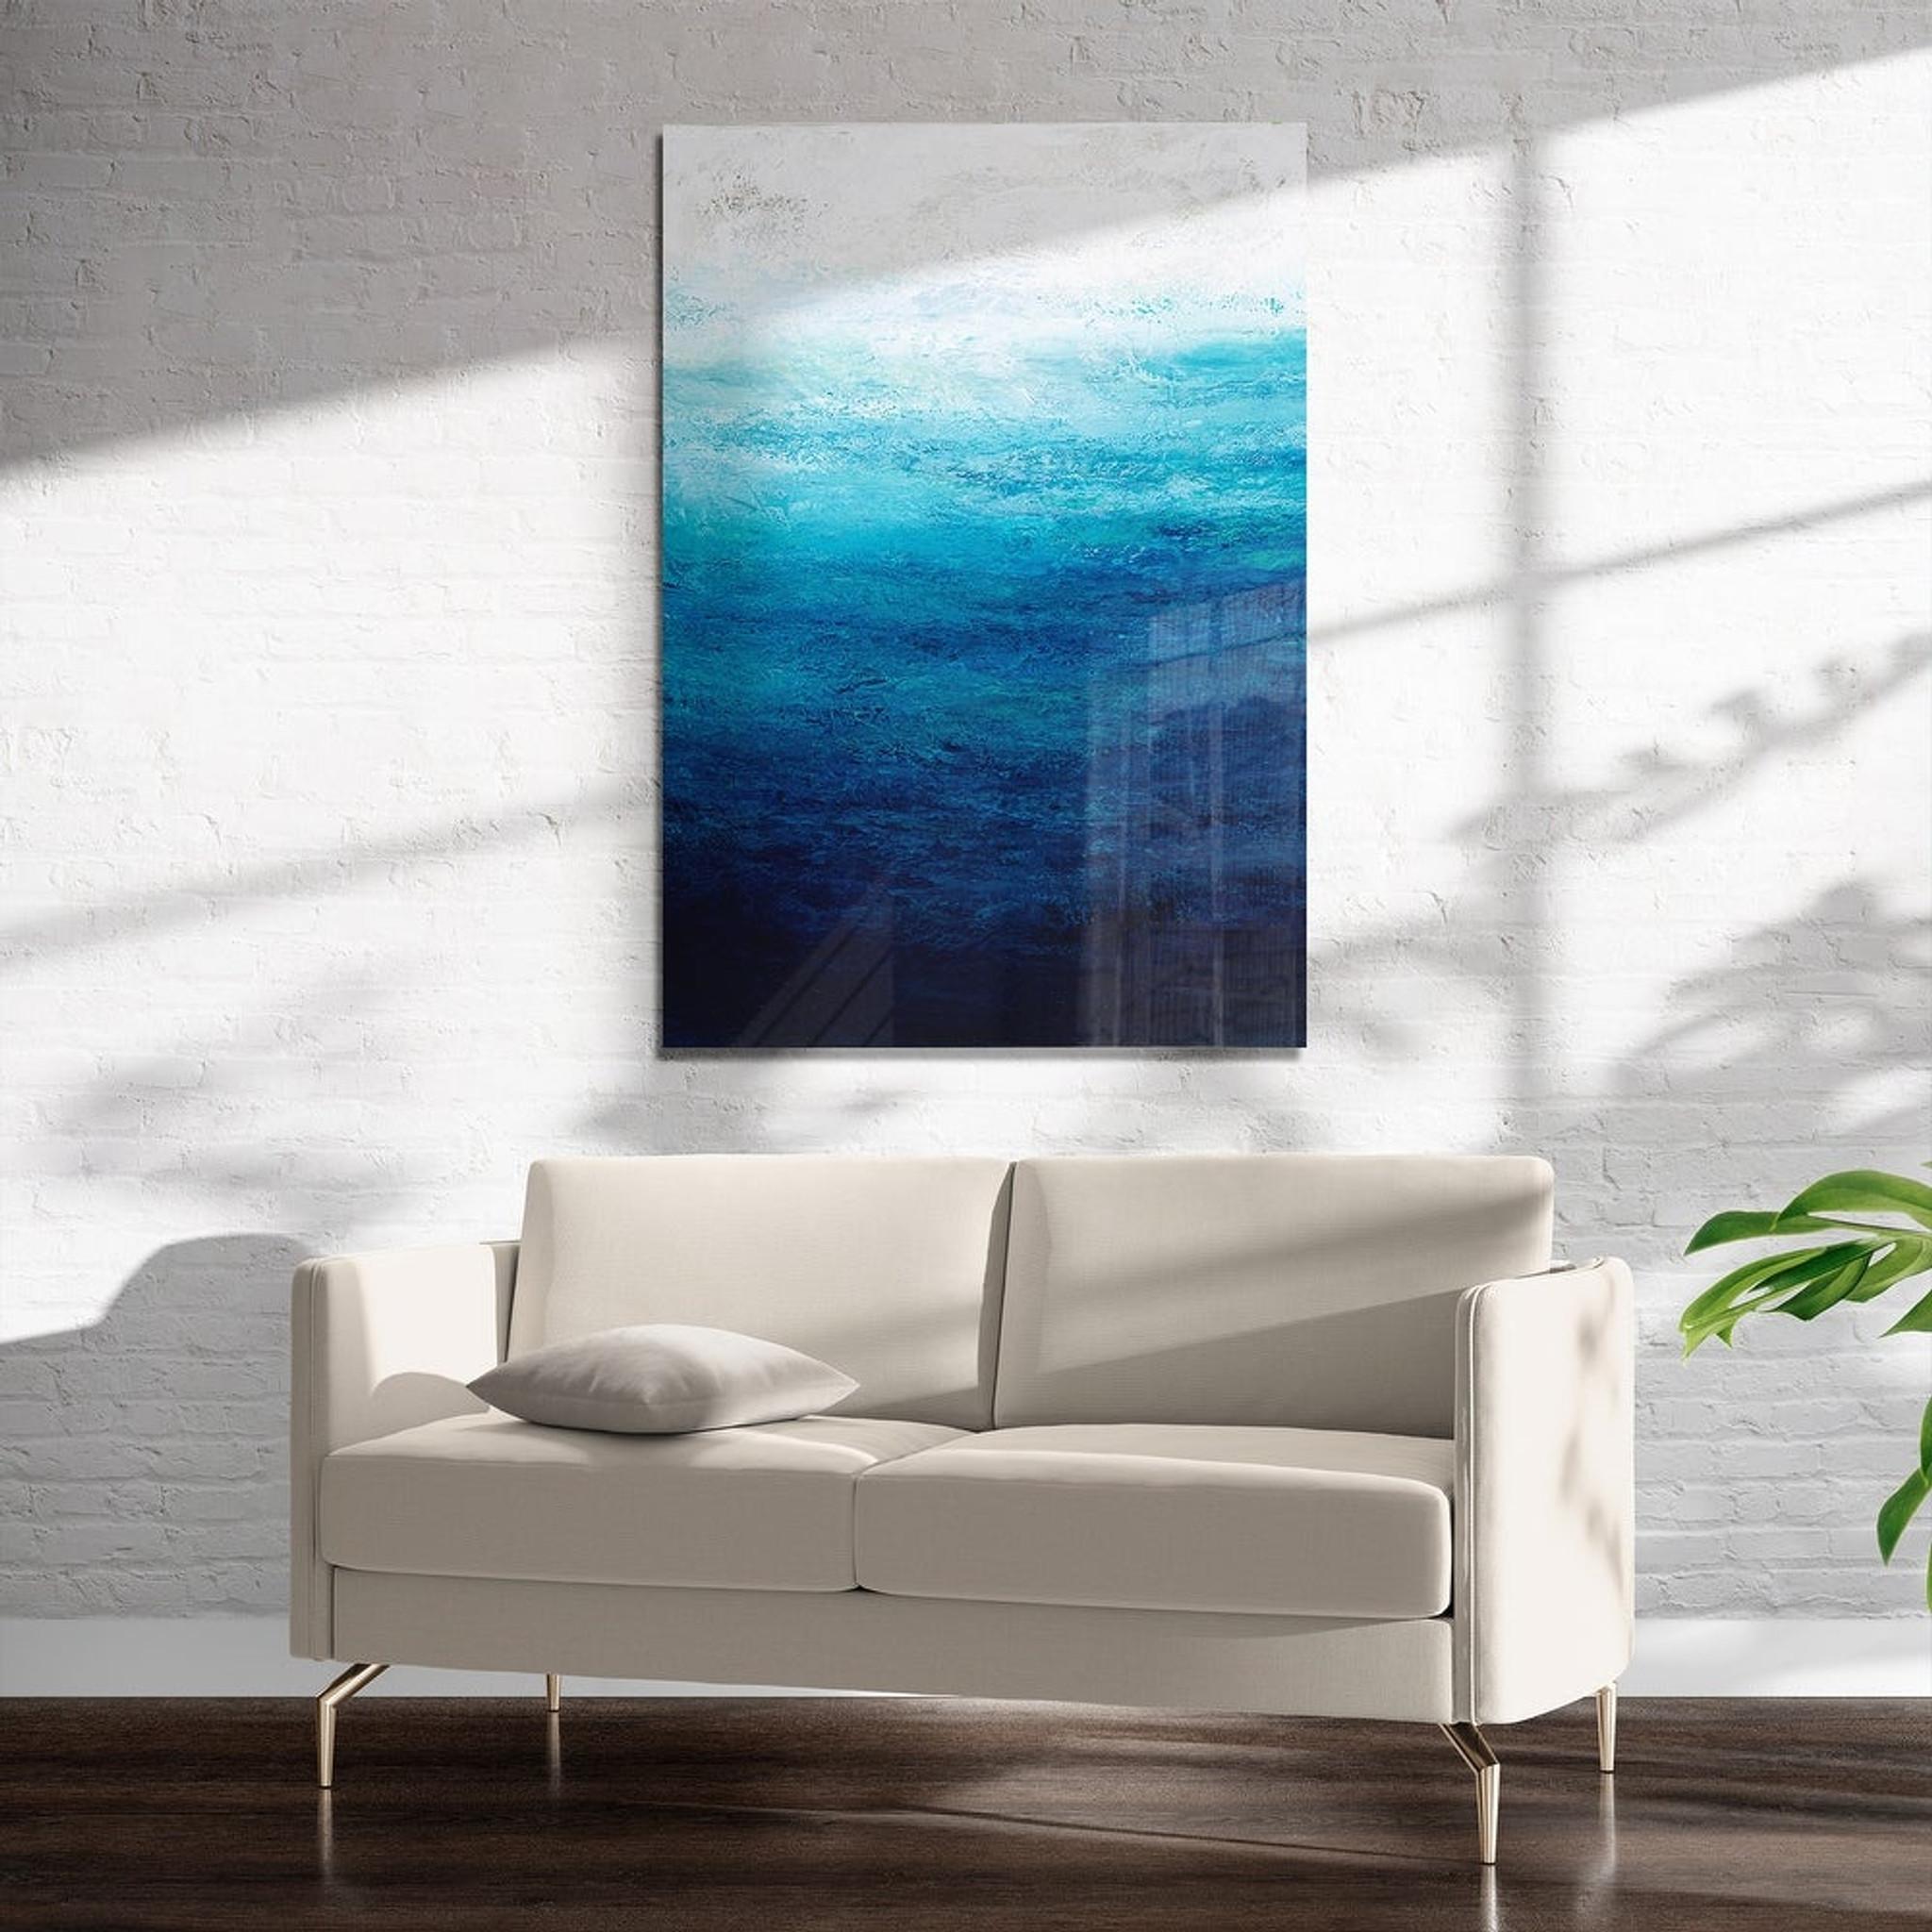 Deep Blue Water on Acrylic Wall Art (horizon art